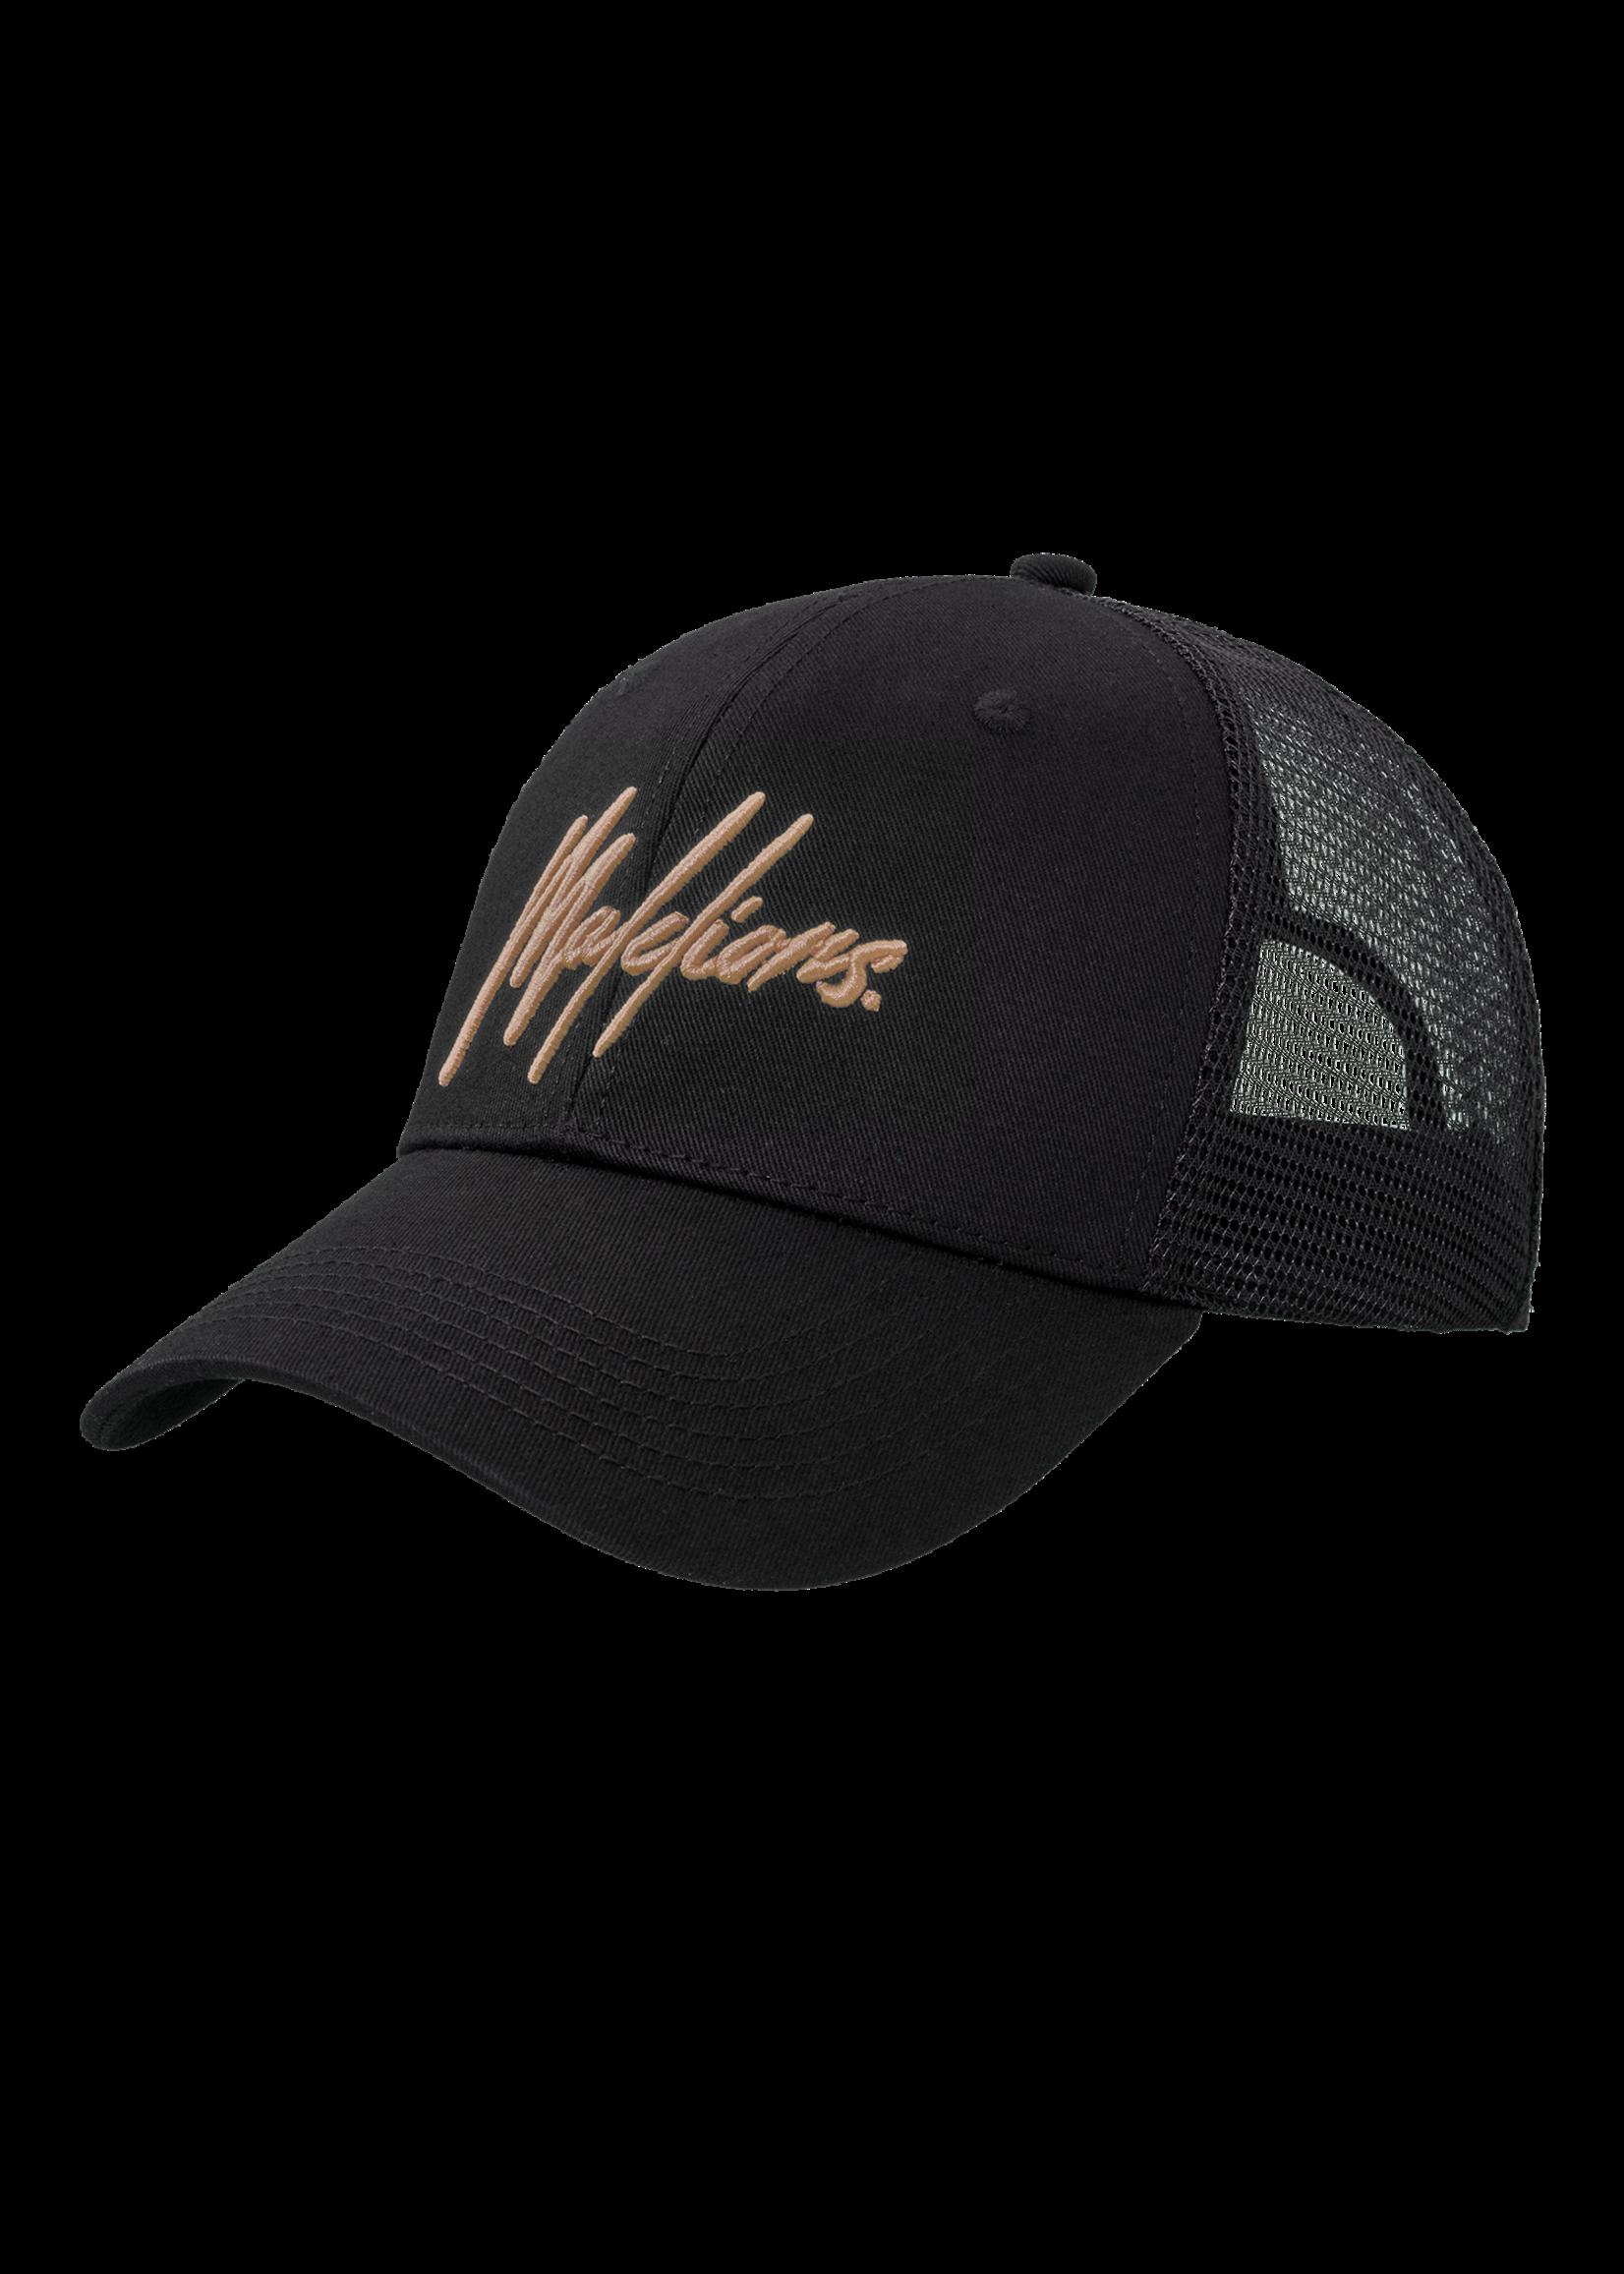 Malelions Malelions Signature Caps - Black/Gold